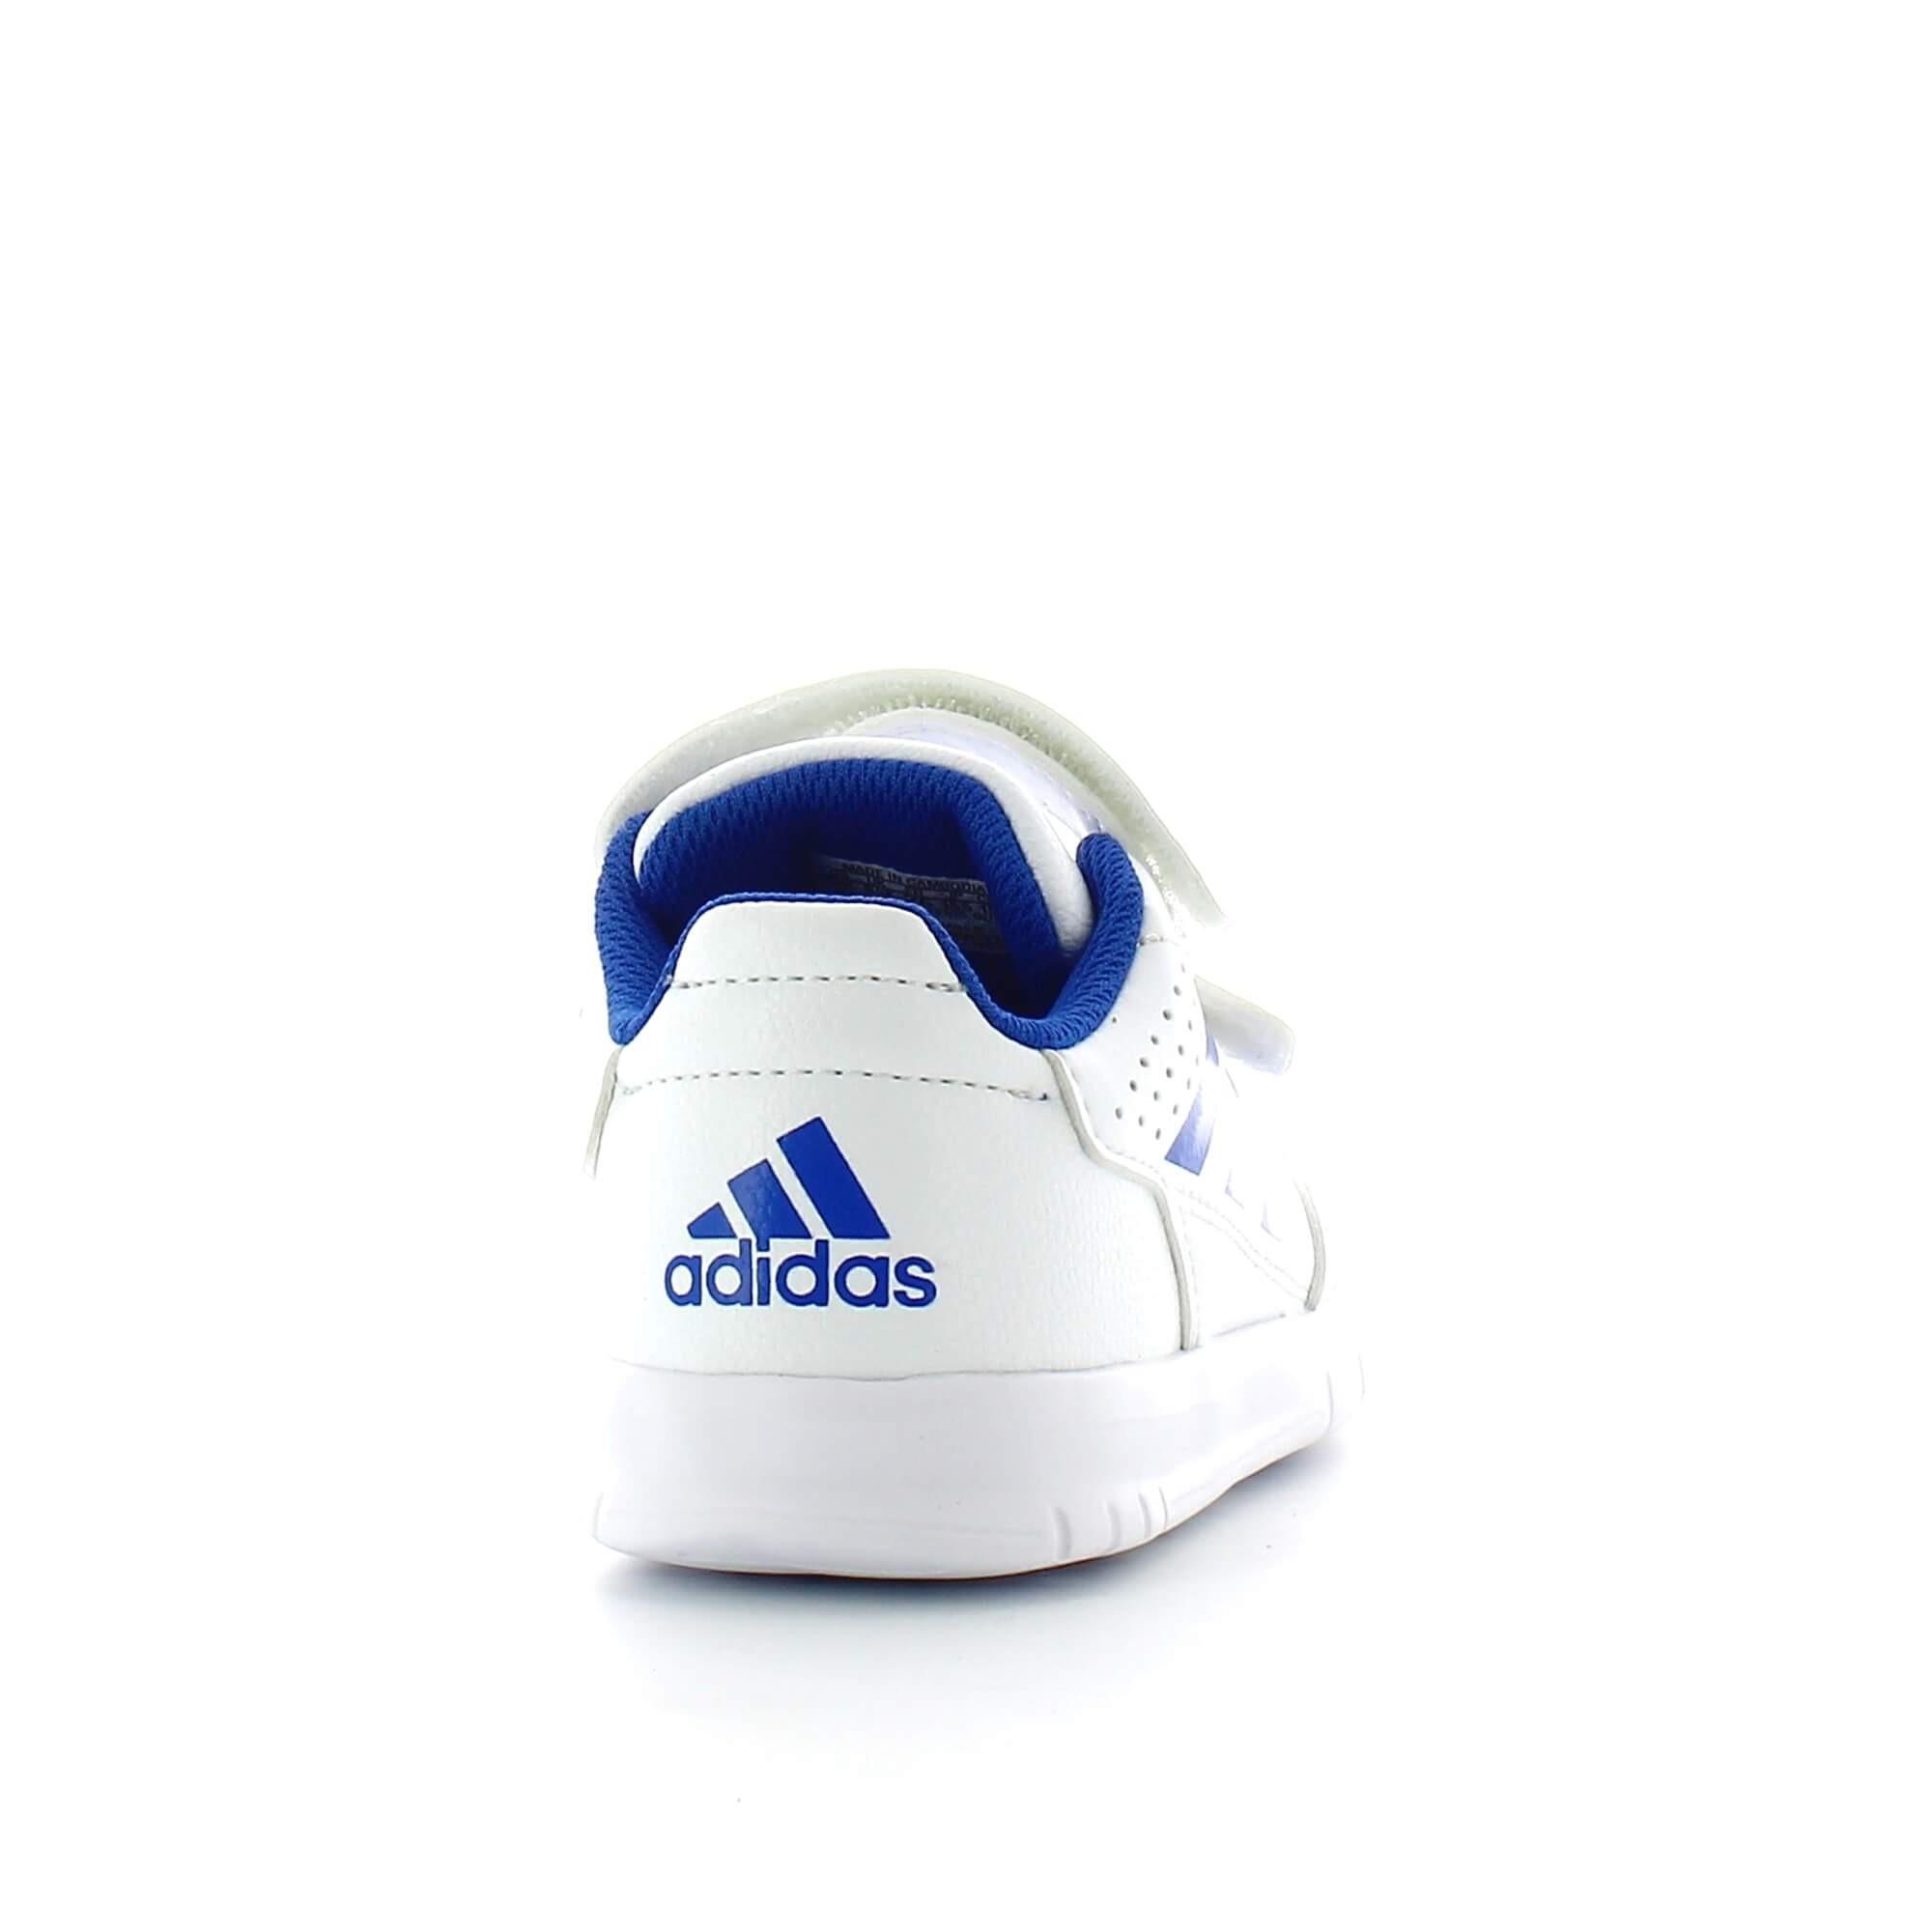 new product b1f56 abd81 Zapatillas Adidas Altasport Cf I BlancoAzul Bebé - Deportes